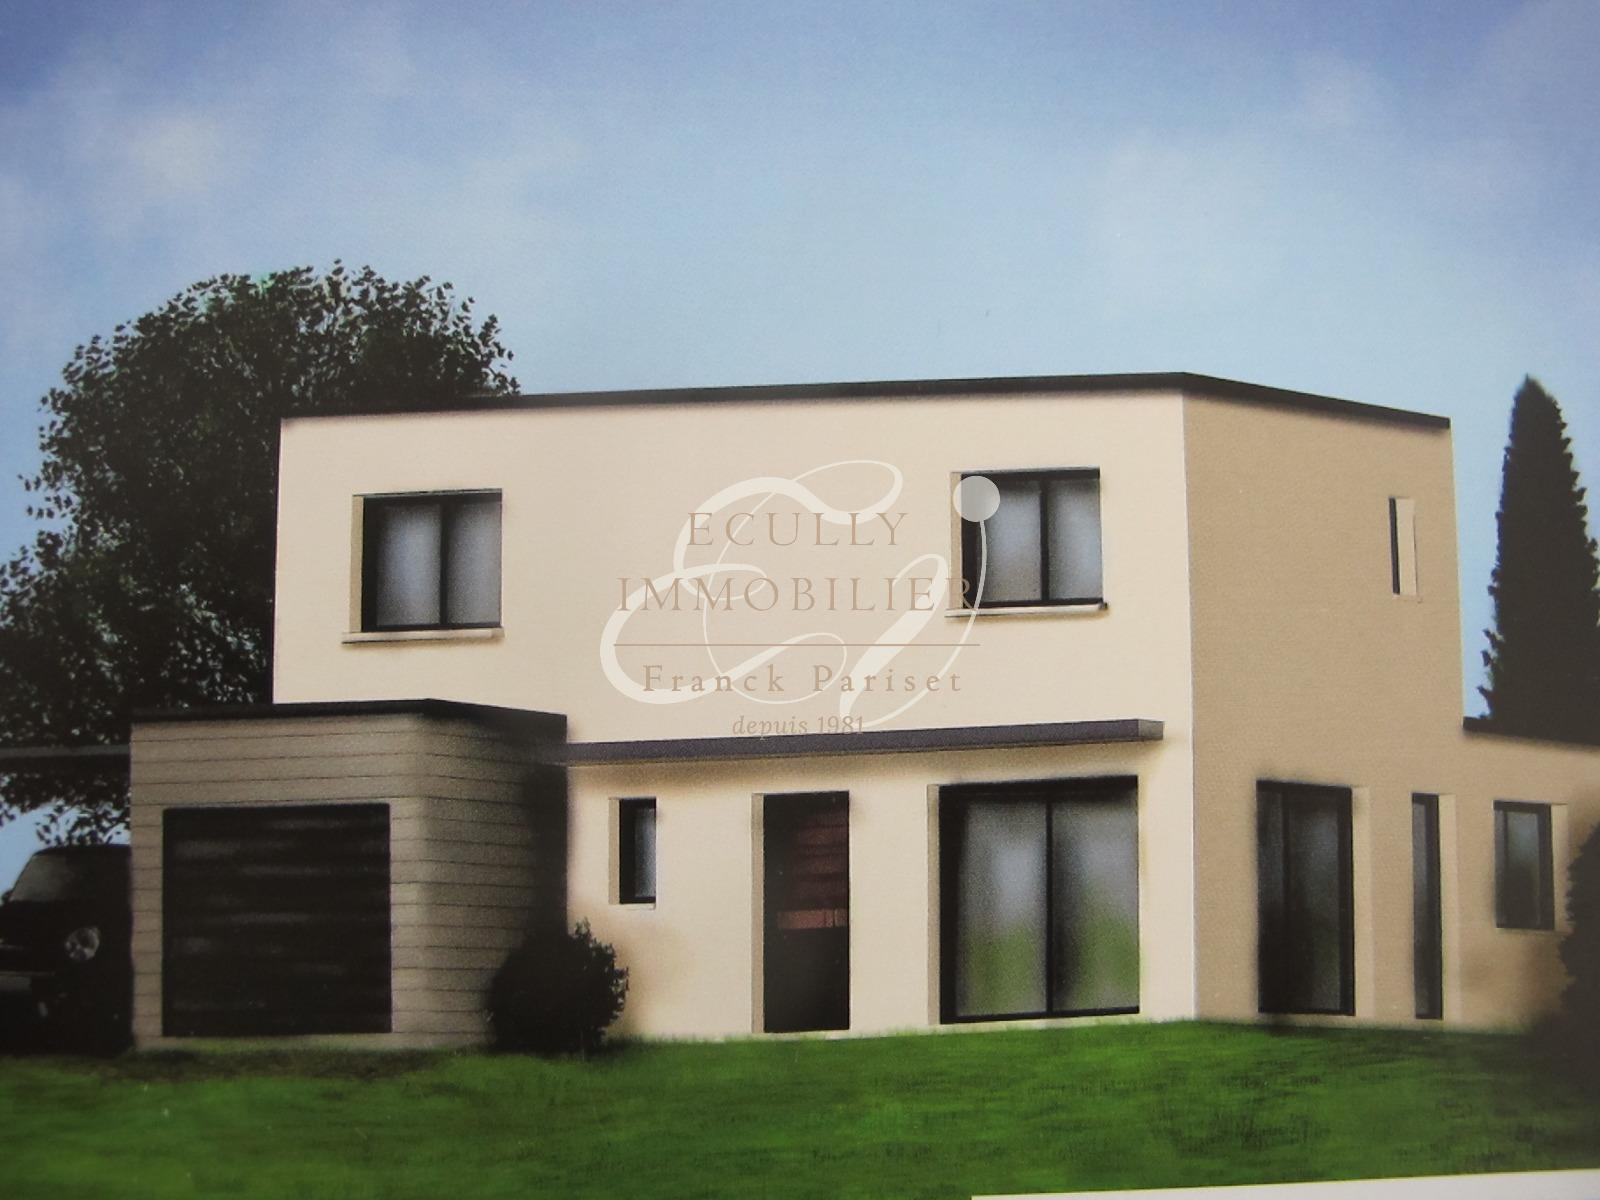 Vente vente dardilly 69570 construction maison de ville for Vente maison en construction